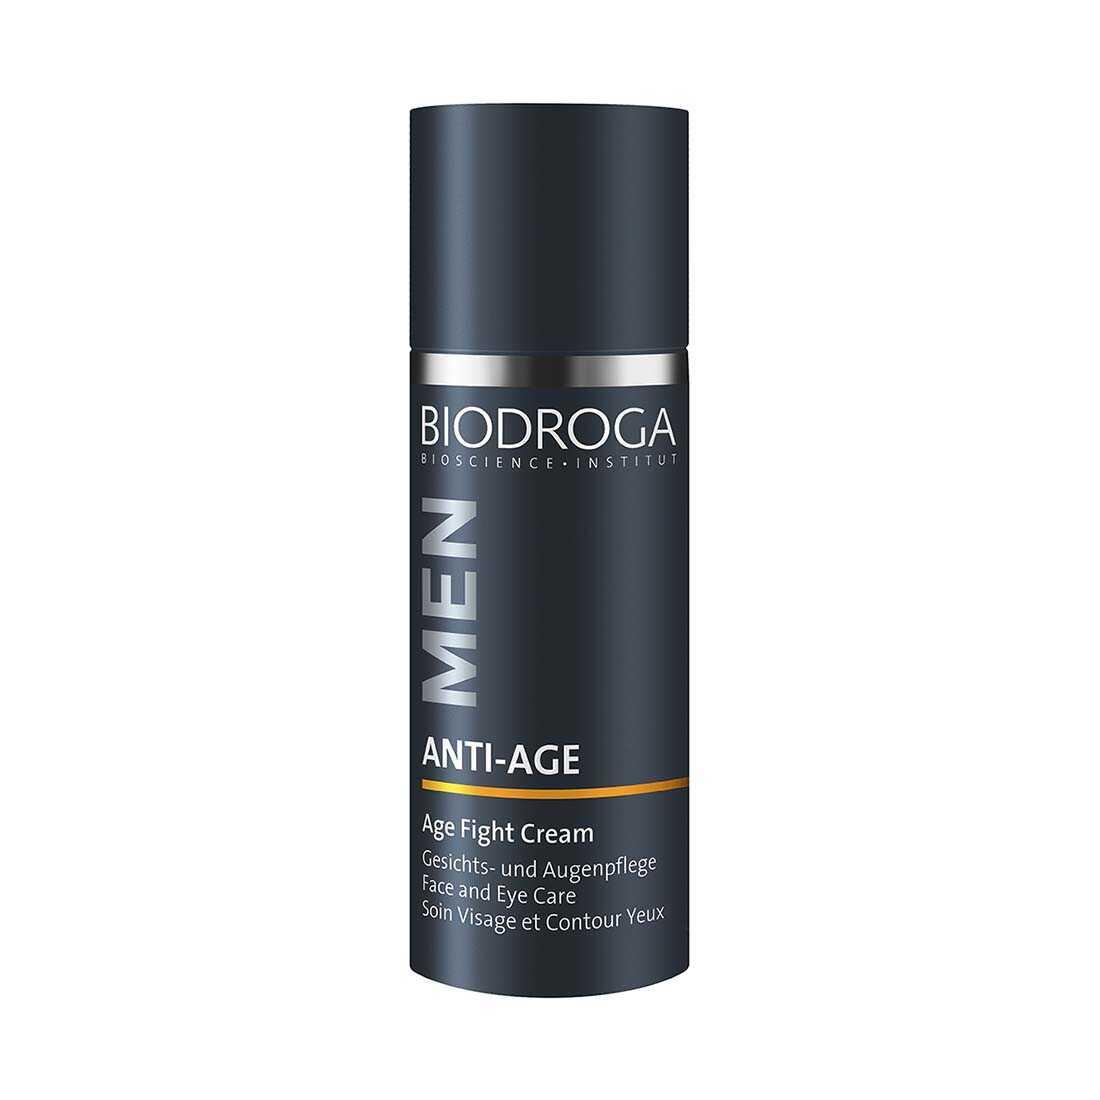 BIODROGA Men ANTI-AGE Age Fight Cream